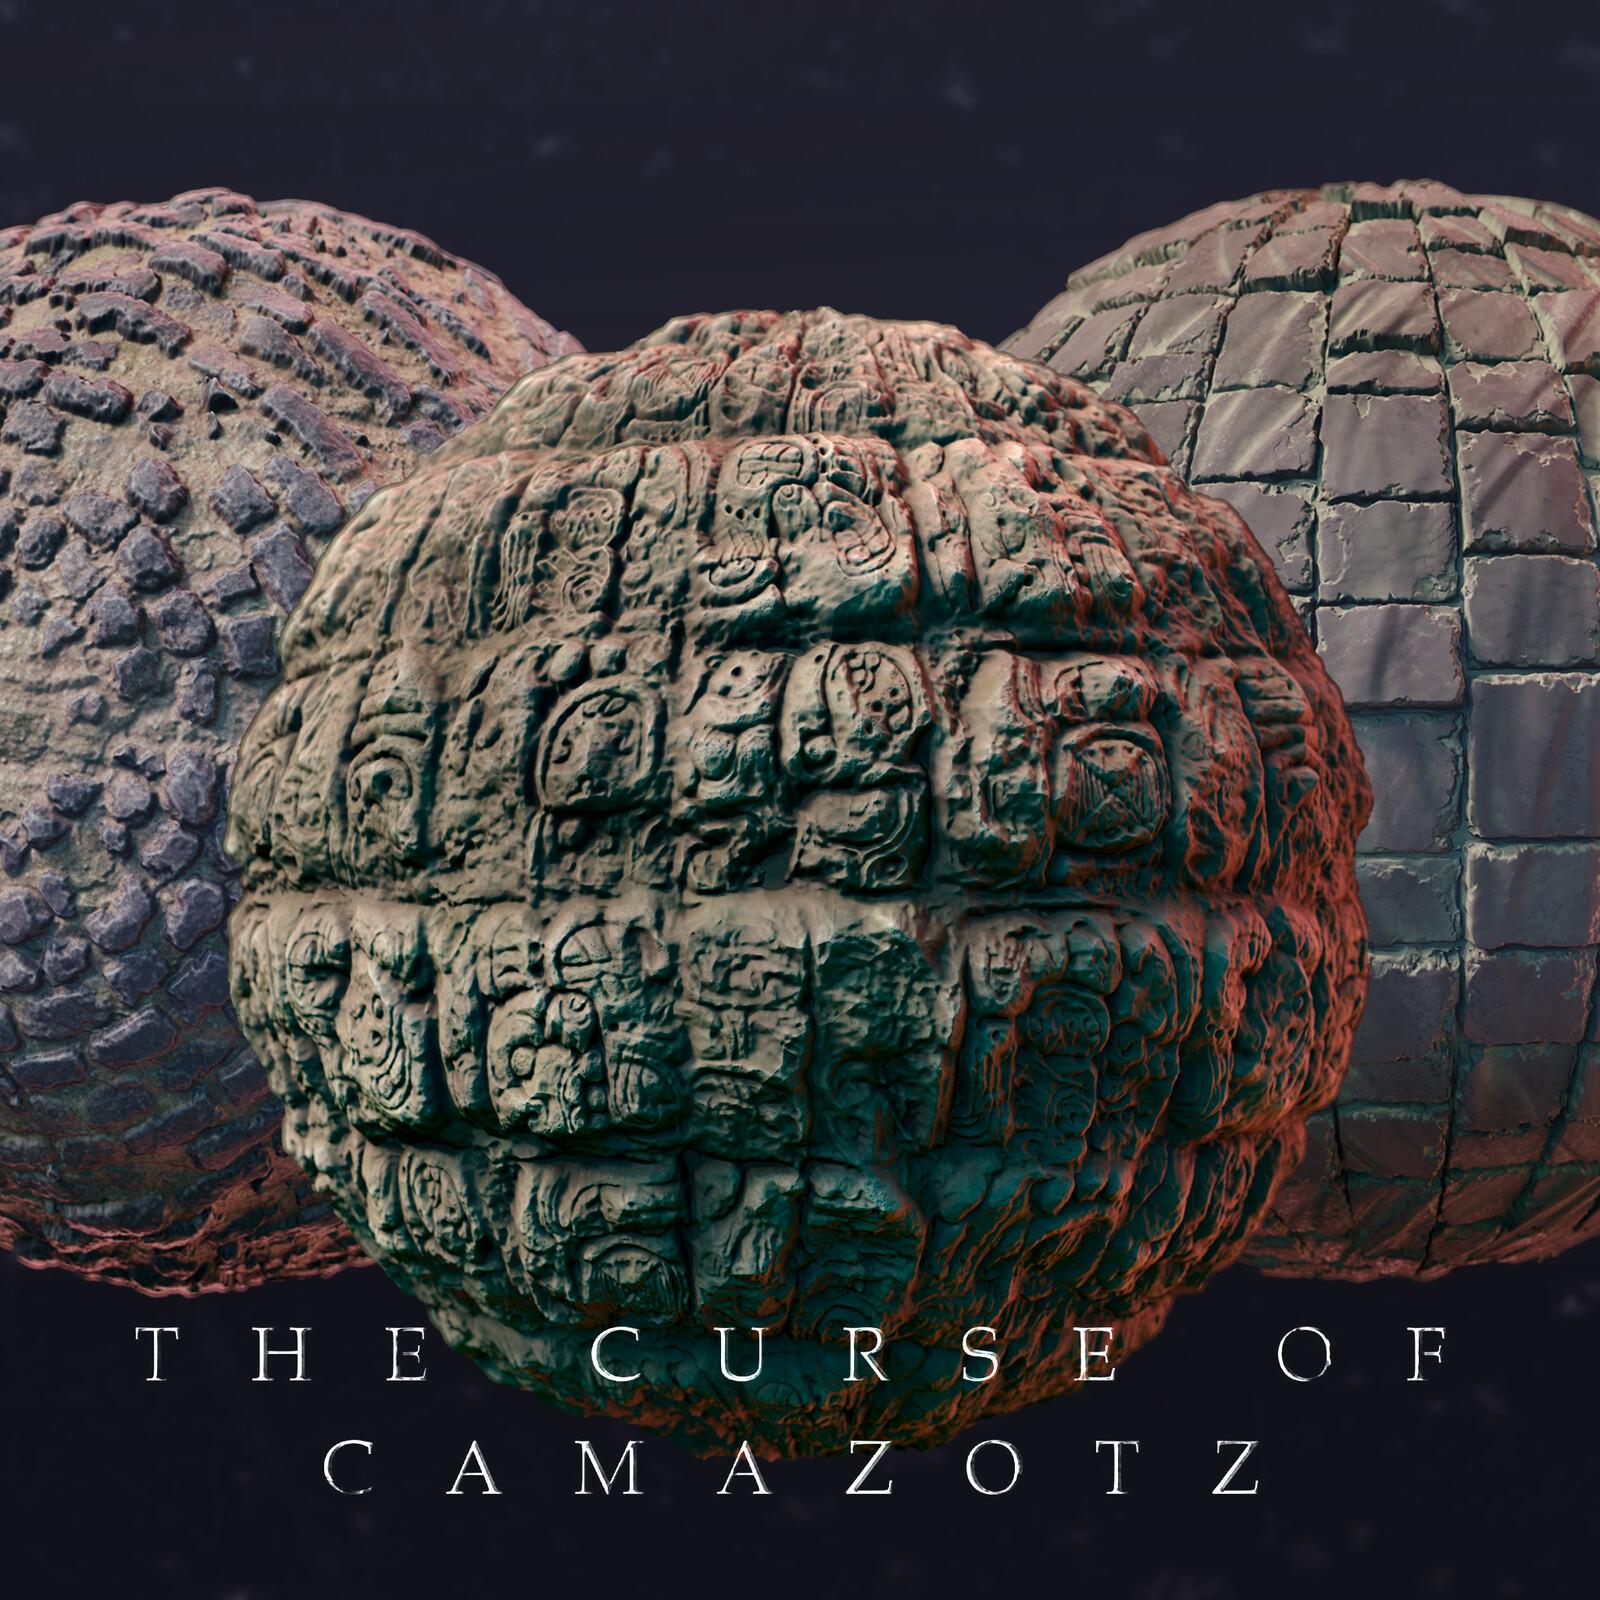 The Curse of Camazots - Materials